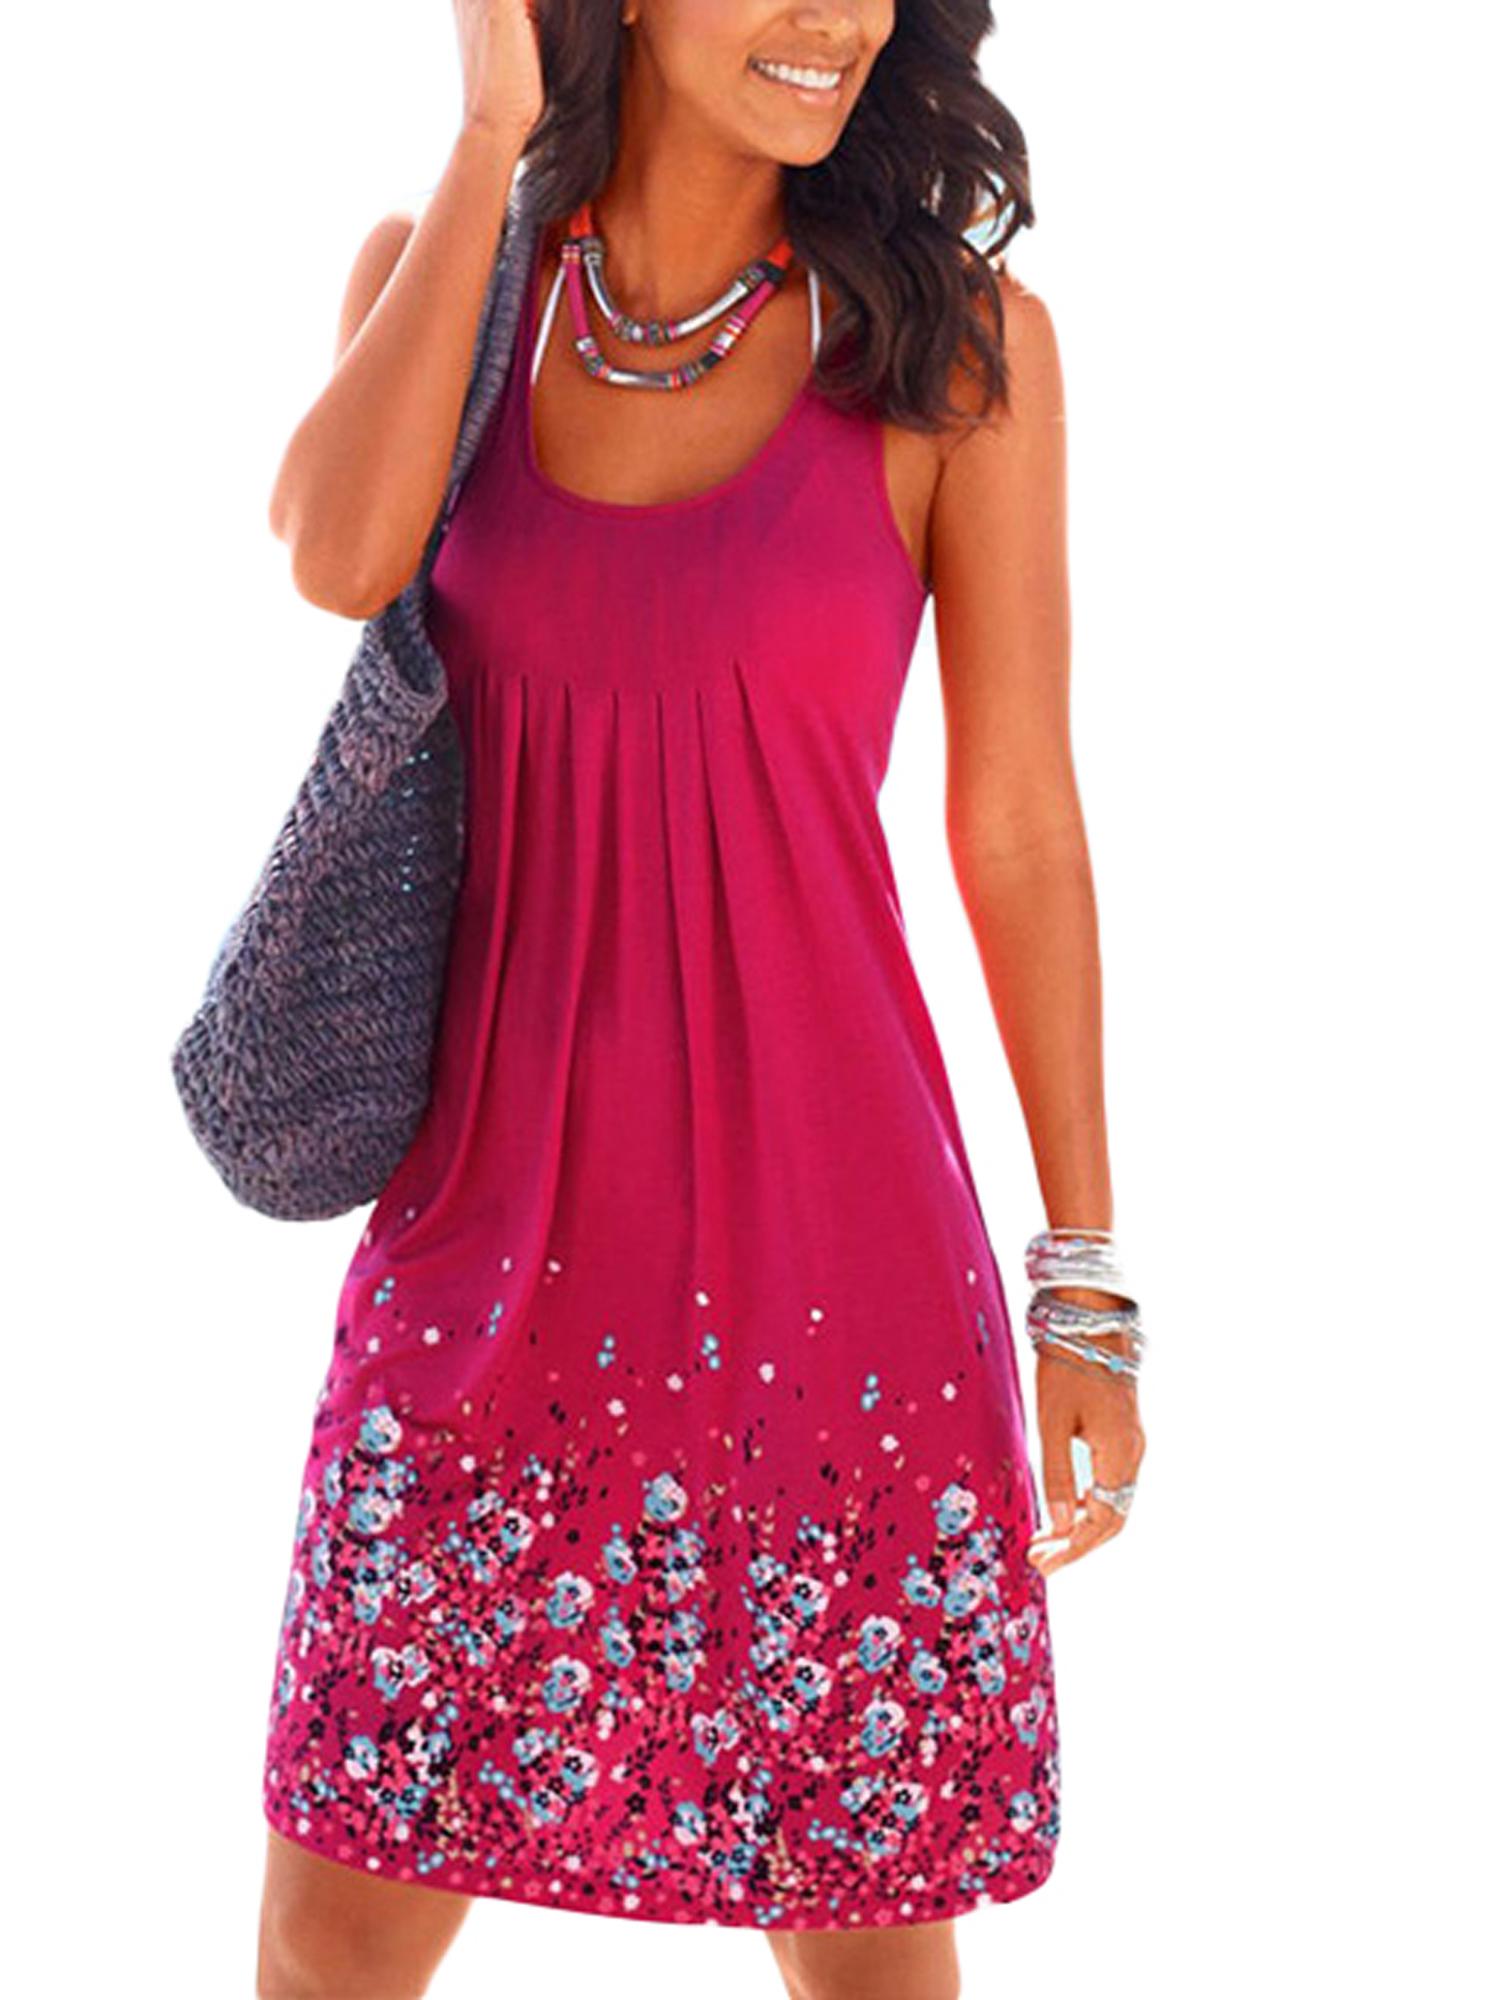 LALLC - Women Boho Floral Sleeveless Plus Size Dress Long Top - Walmart.com